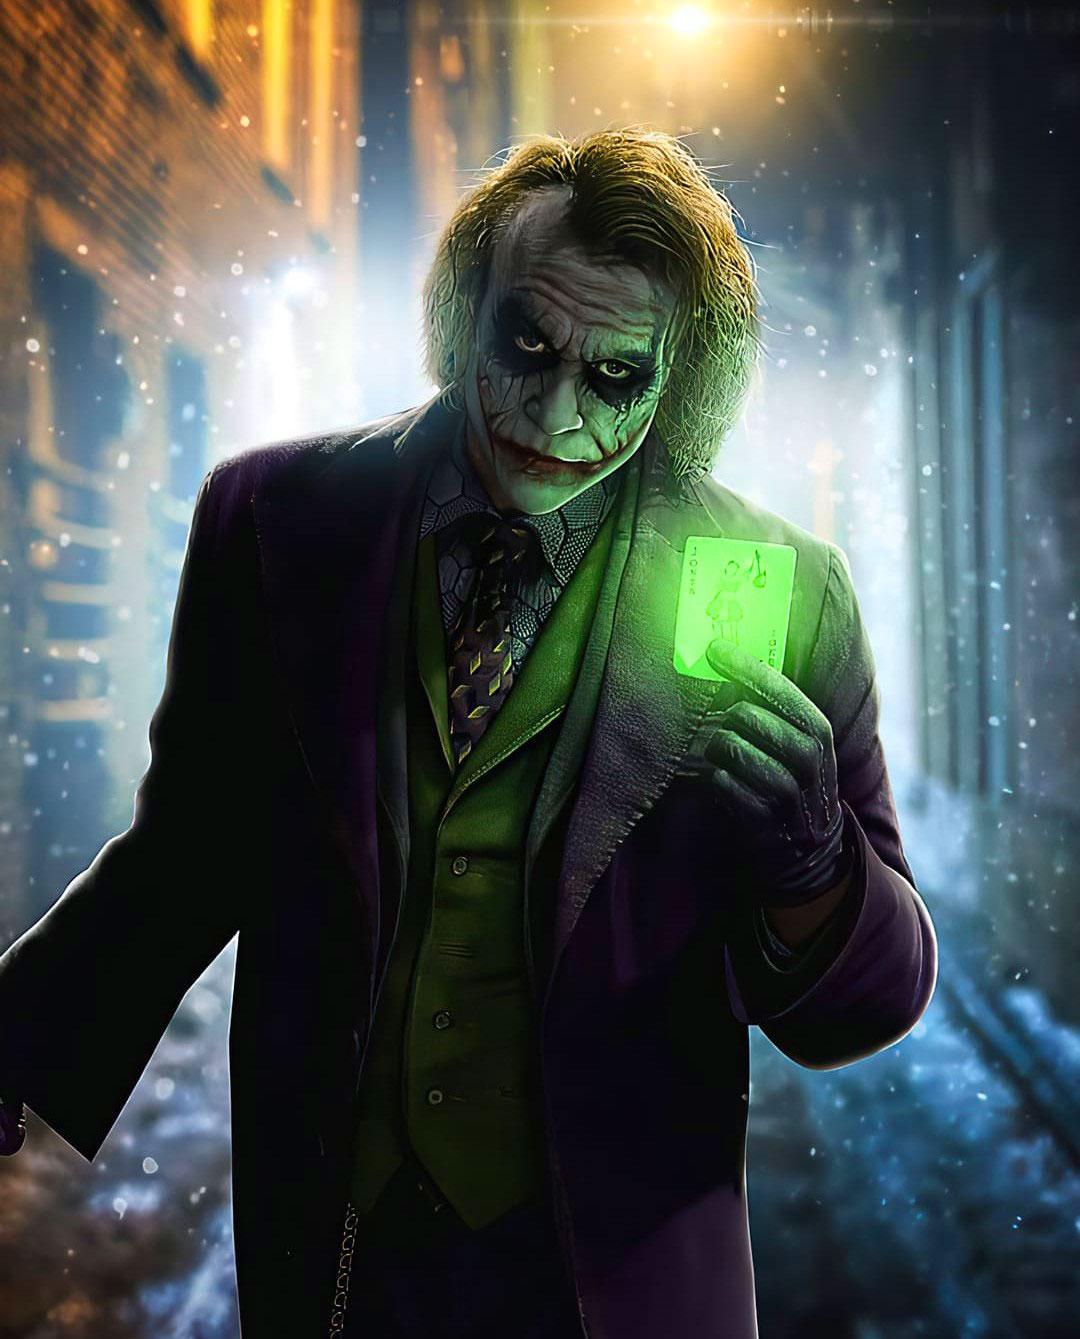 Latest Joker Dp Images wallpaper hd download